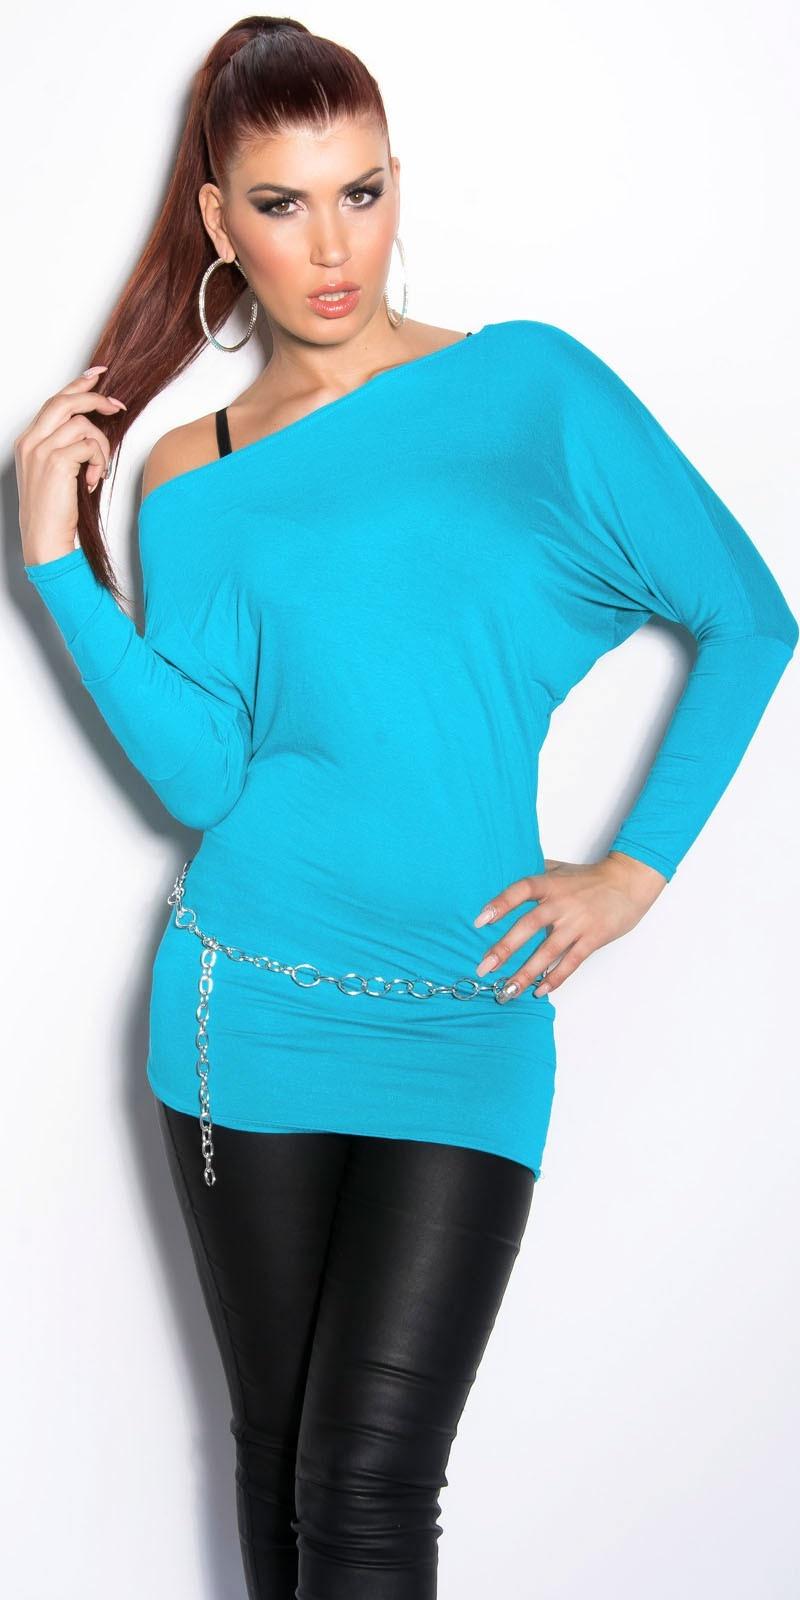 Sexy vleermuis-shirt turkoois-kleurig